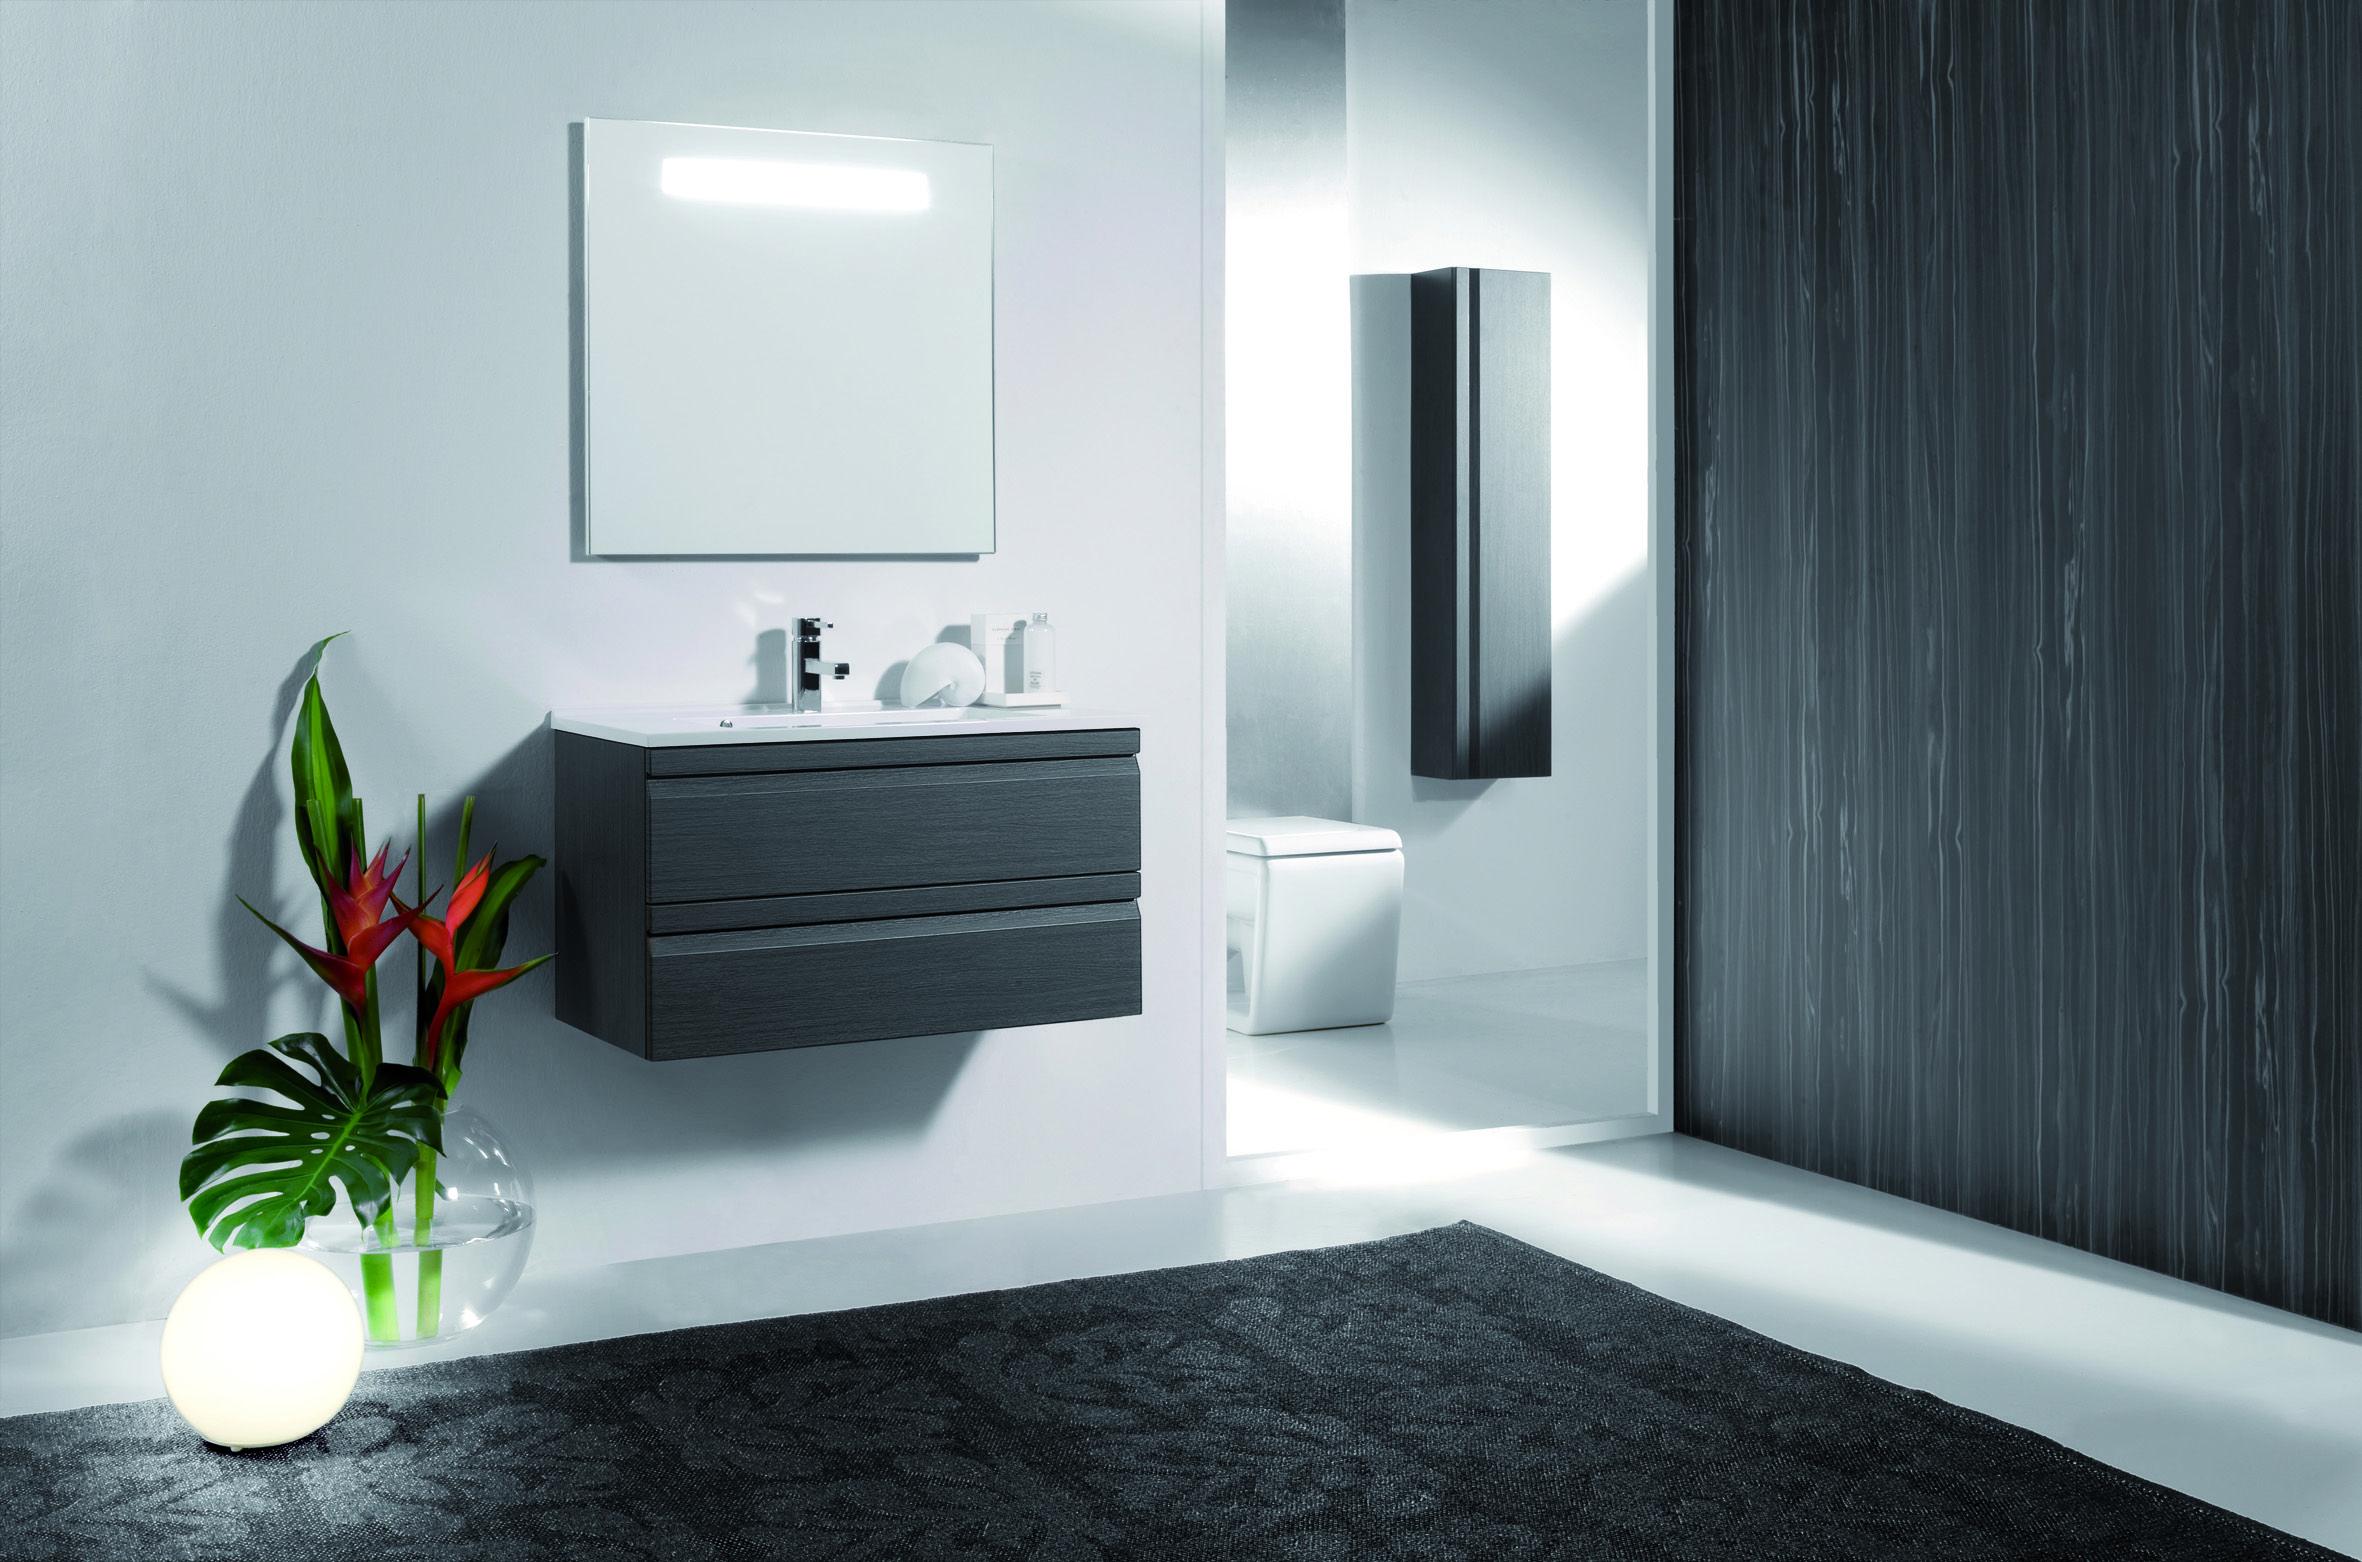 Maak optimaal gebruik van je badkamer. Sobere design look met ...